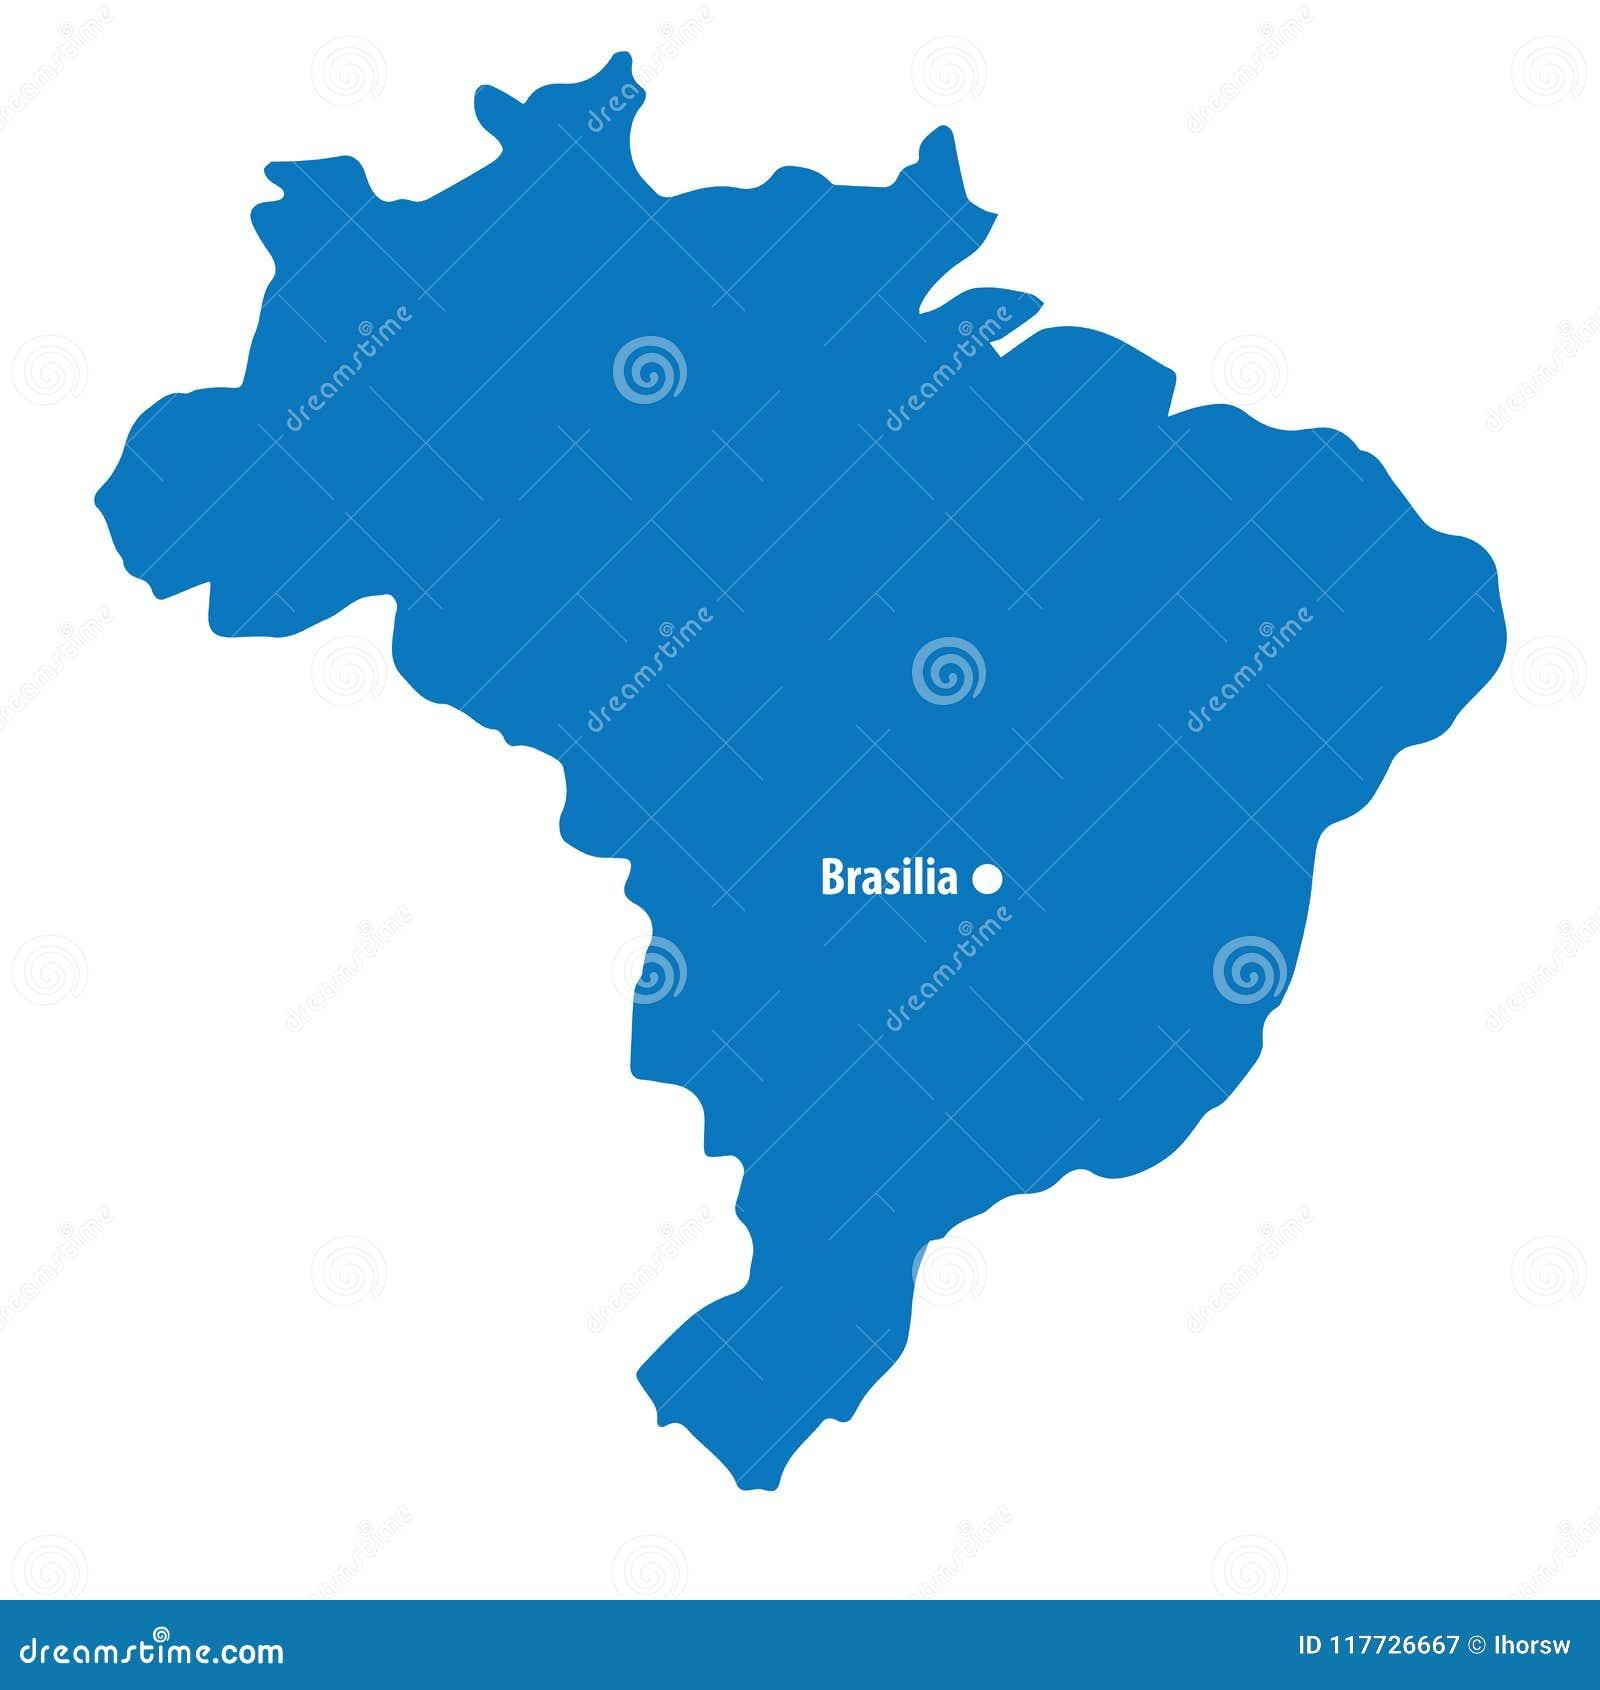 Image of: Blank Blue Similar Brazil Map With Capital City Brasilia Isolated On White Background South America Stock Vector Illustration Of Brazil Border 117726667